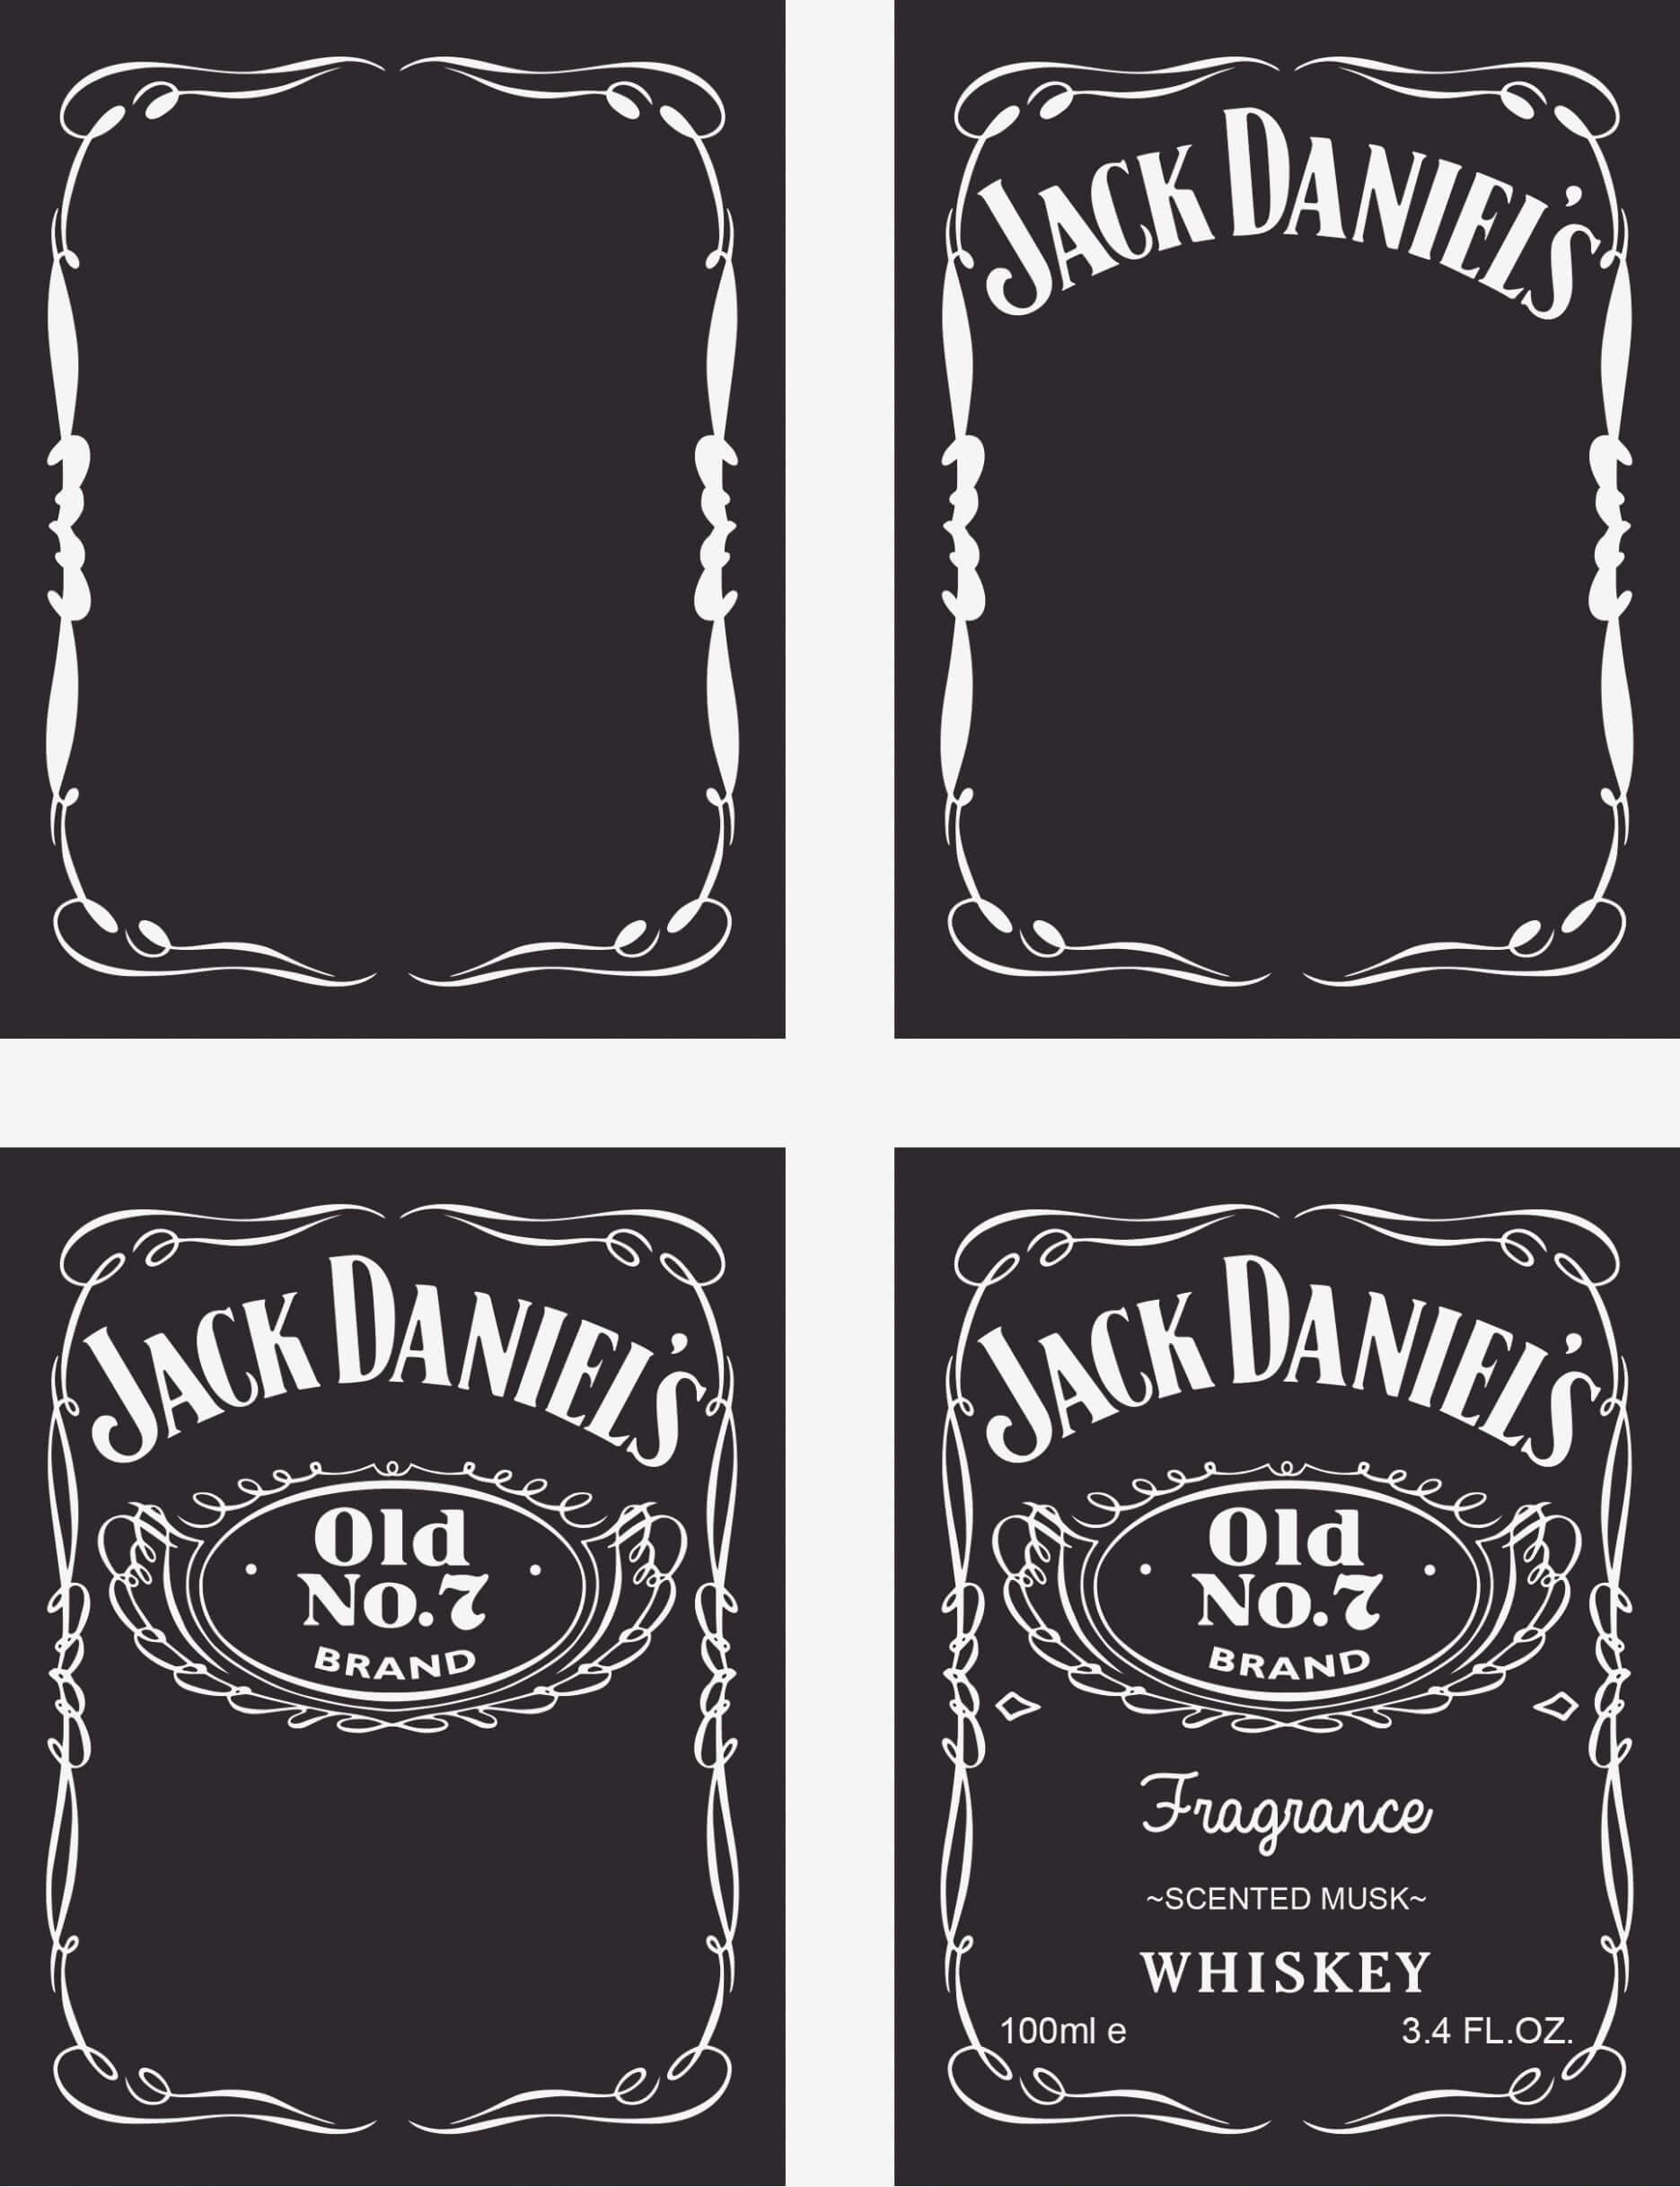 Custom Jack Daniels Label Template - Trovoadasonhos With Blank Jack Daniels Label Template